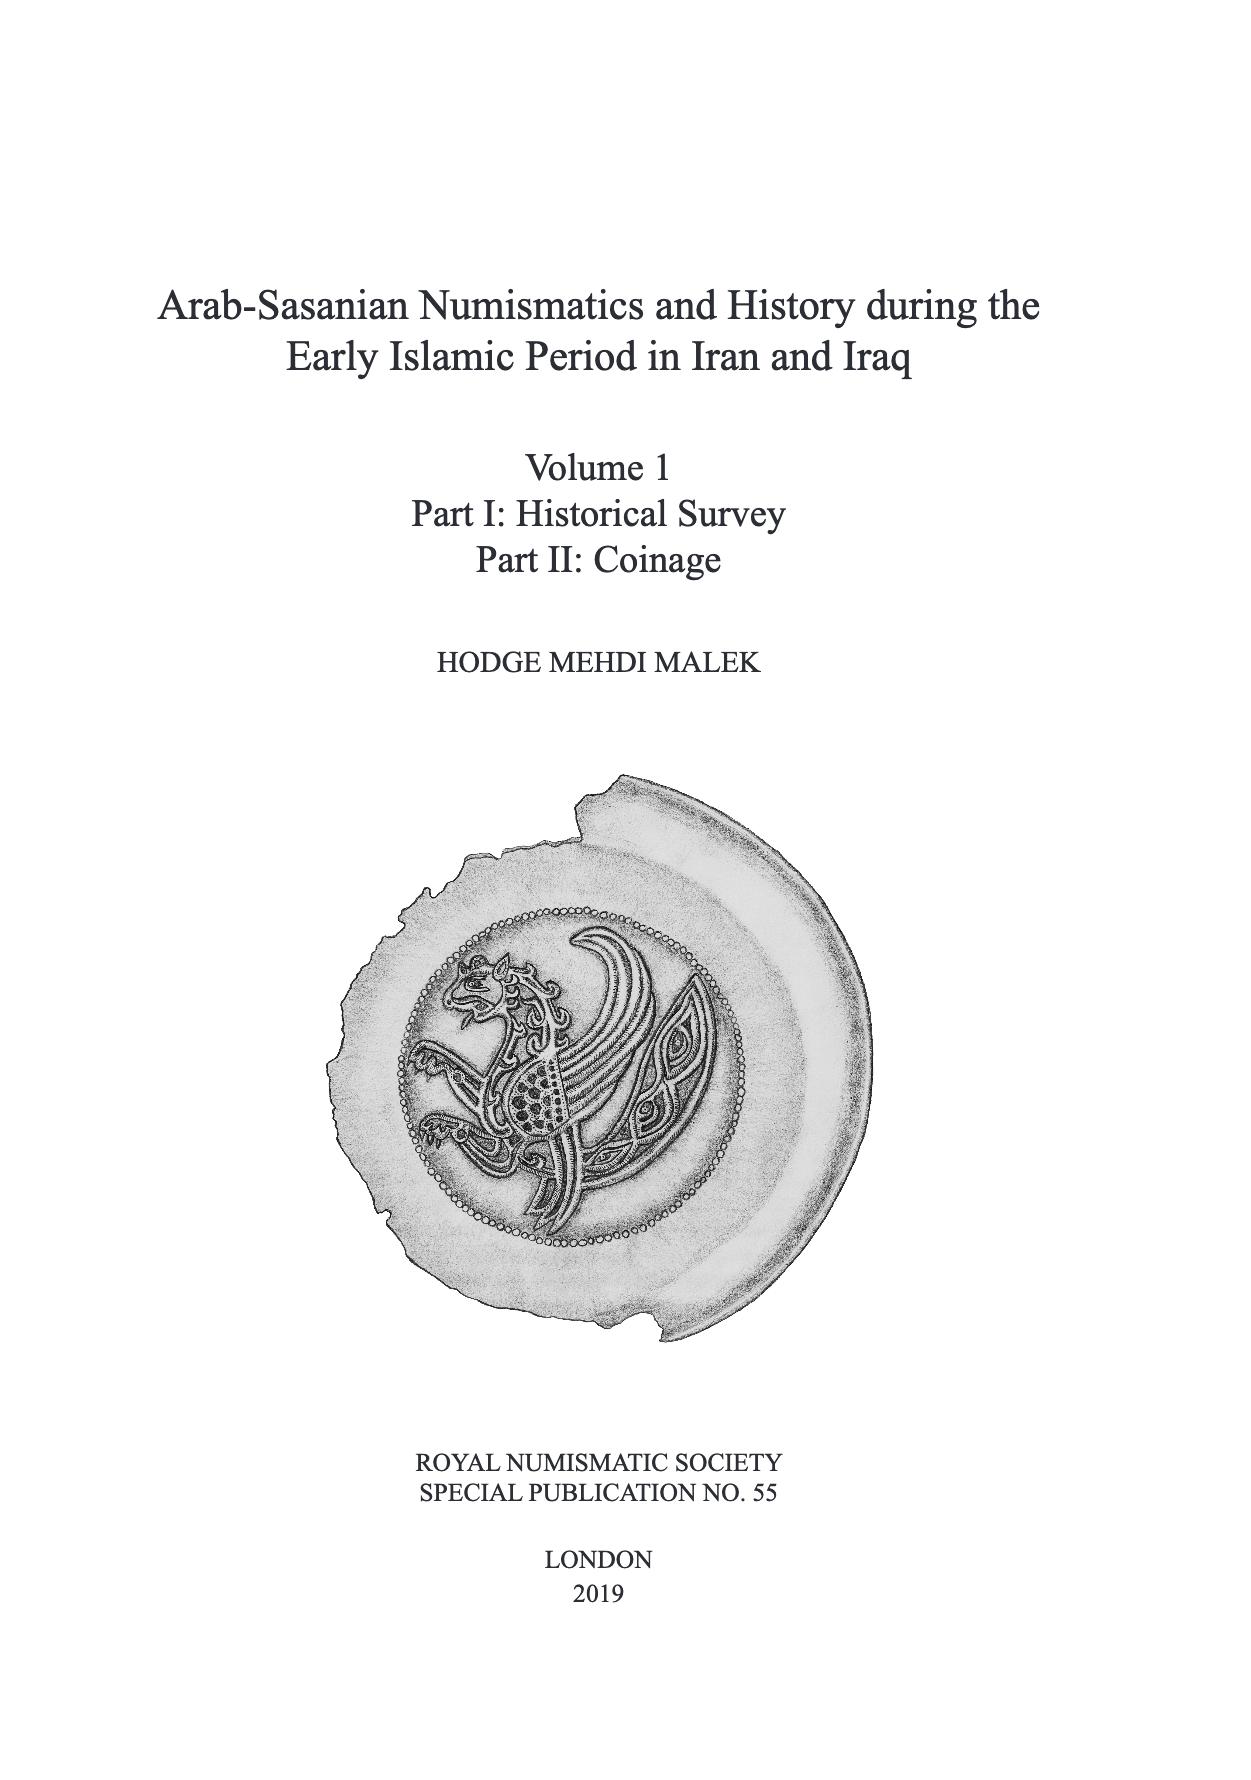 The Royal Numismatic Society